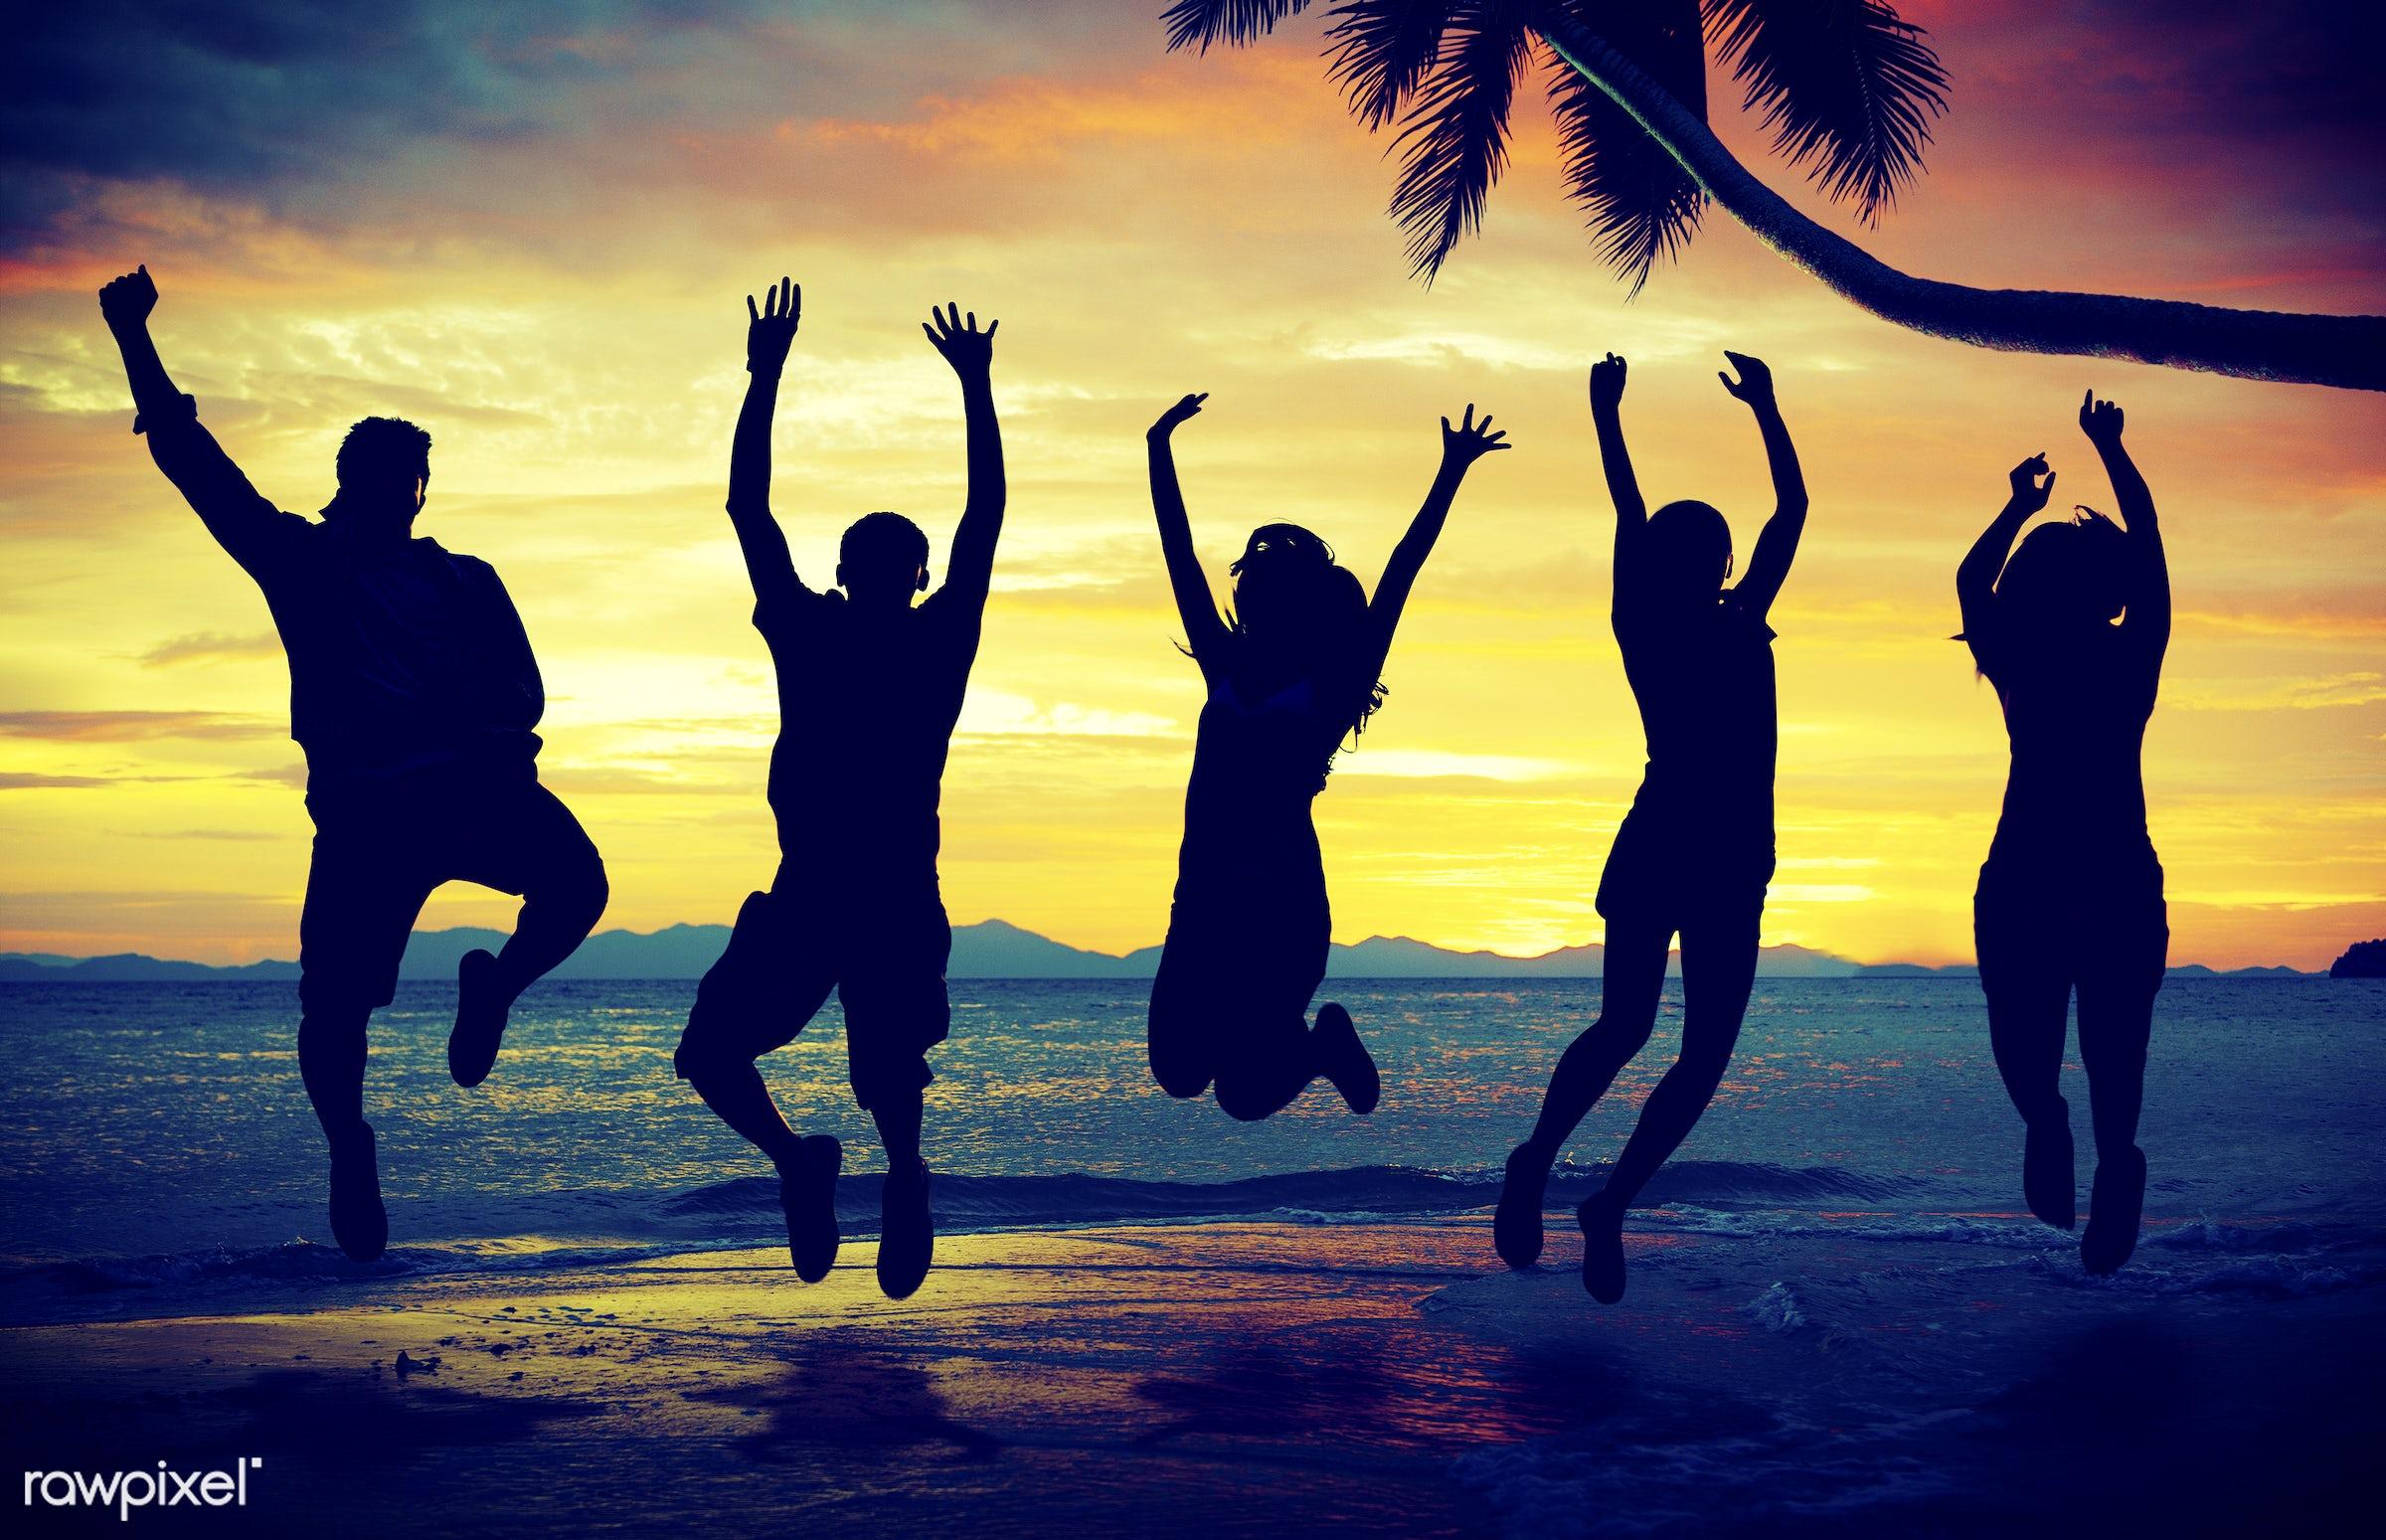 dusk, adult, back lit, beach, beach party, celebration, cheerful, cloudscape, community, ecstatic, enjoyment, freedom,...